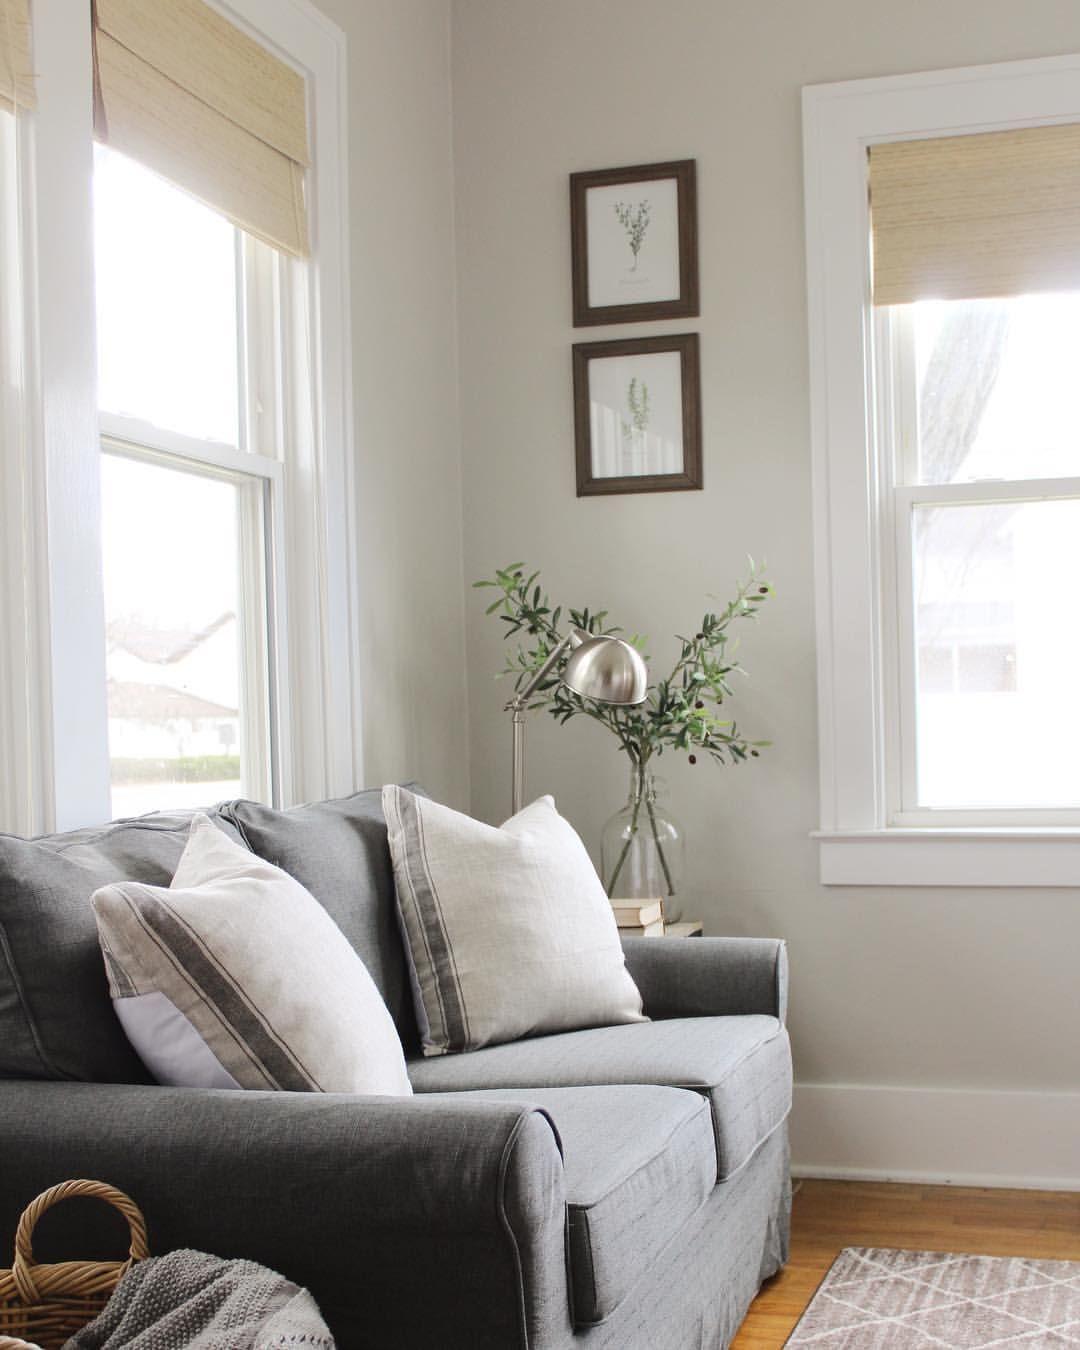 Interior Sunroom Addition Ideas: Cozy Modern Farmhouse Sunroom Decor Ideas #sunroom